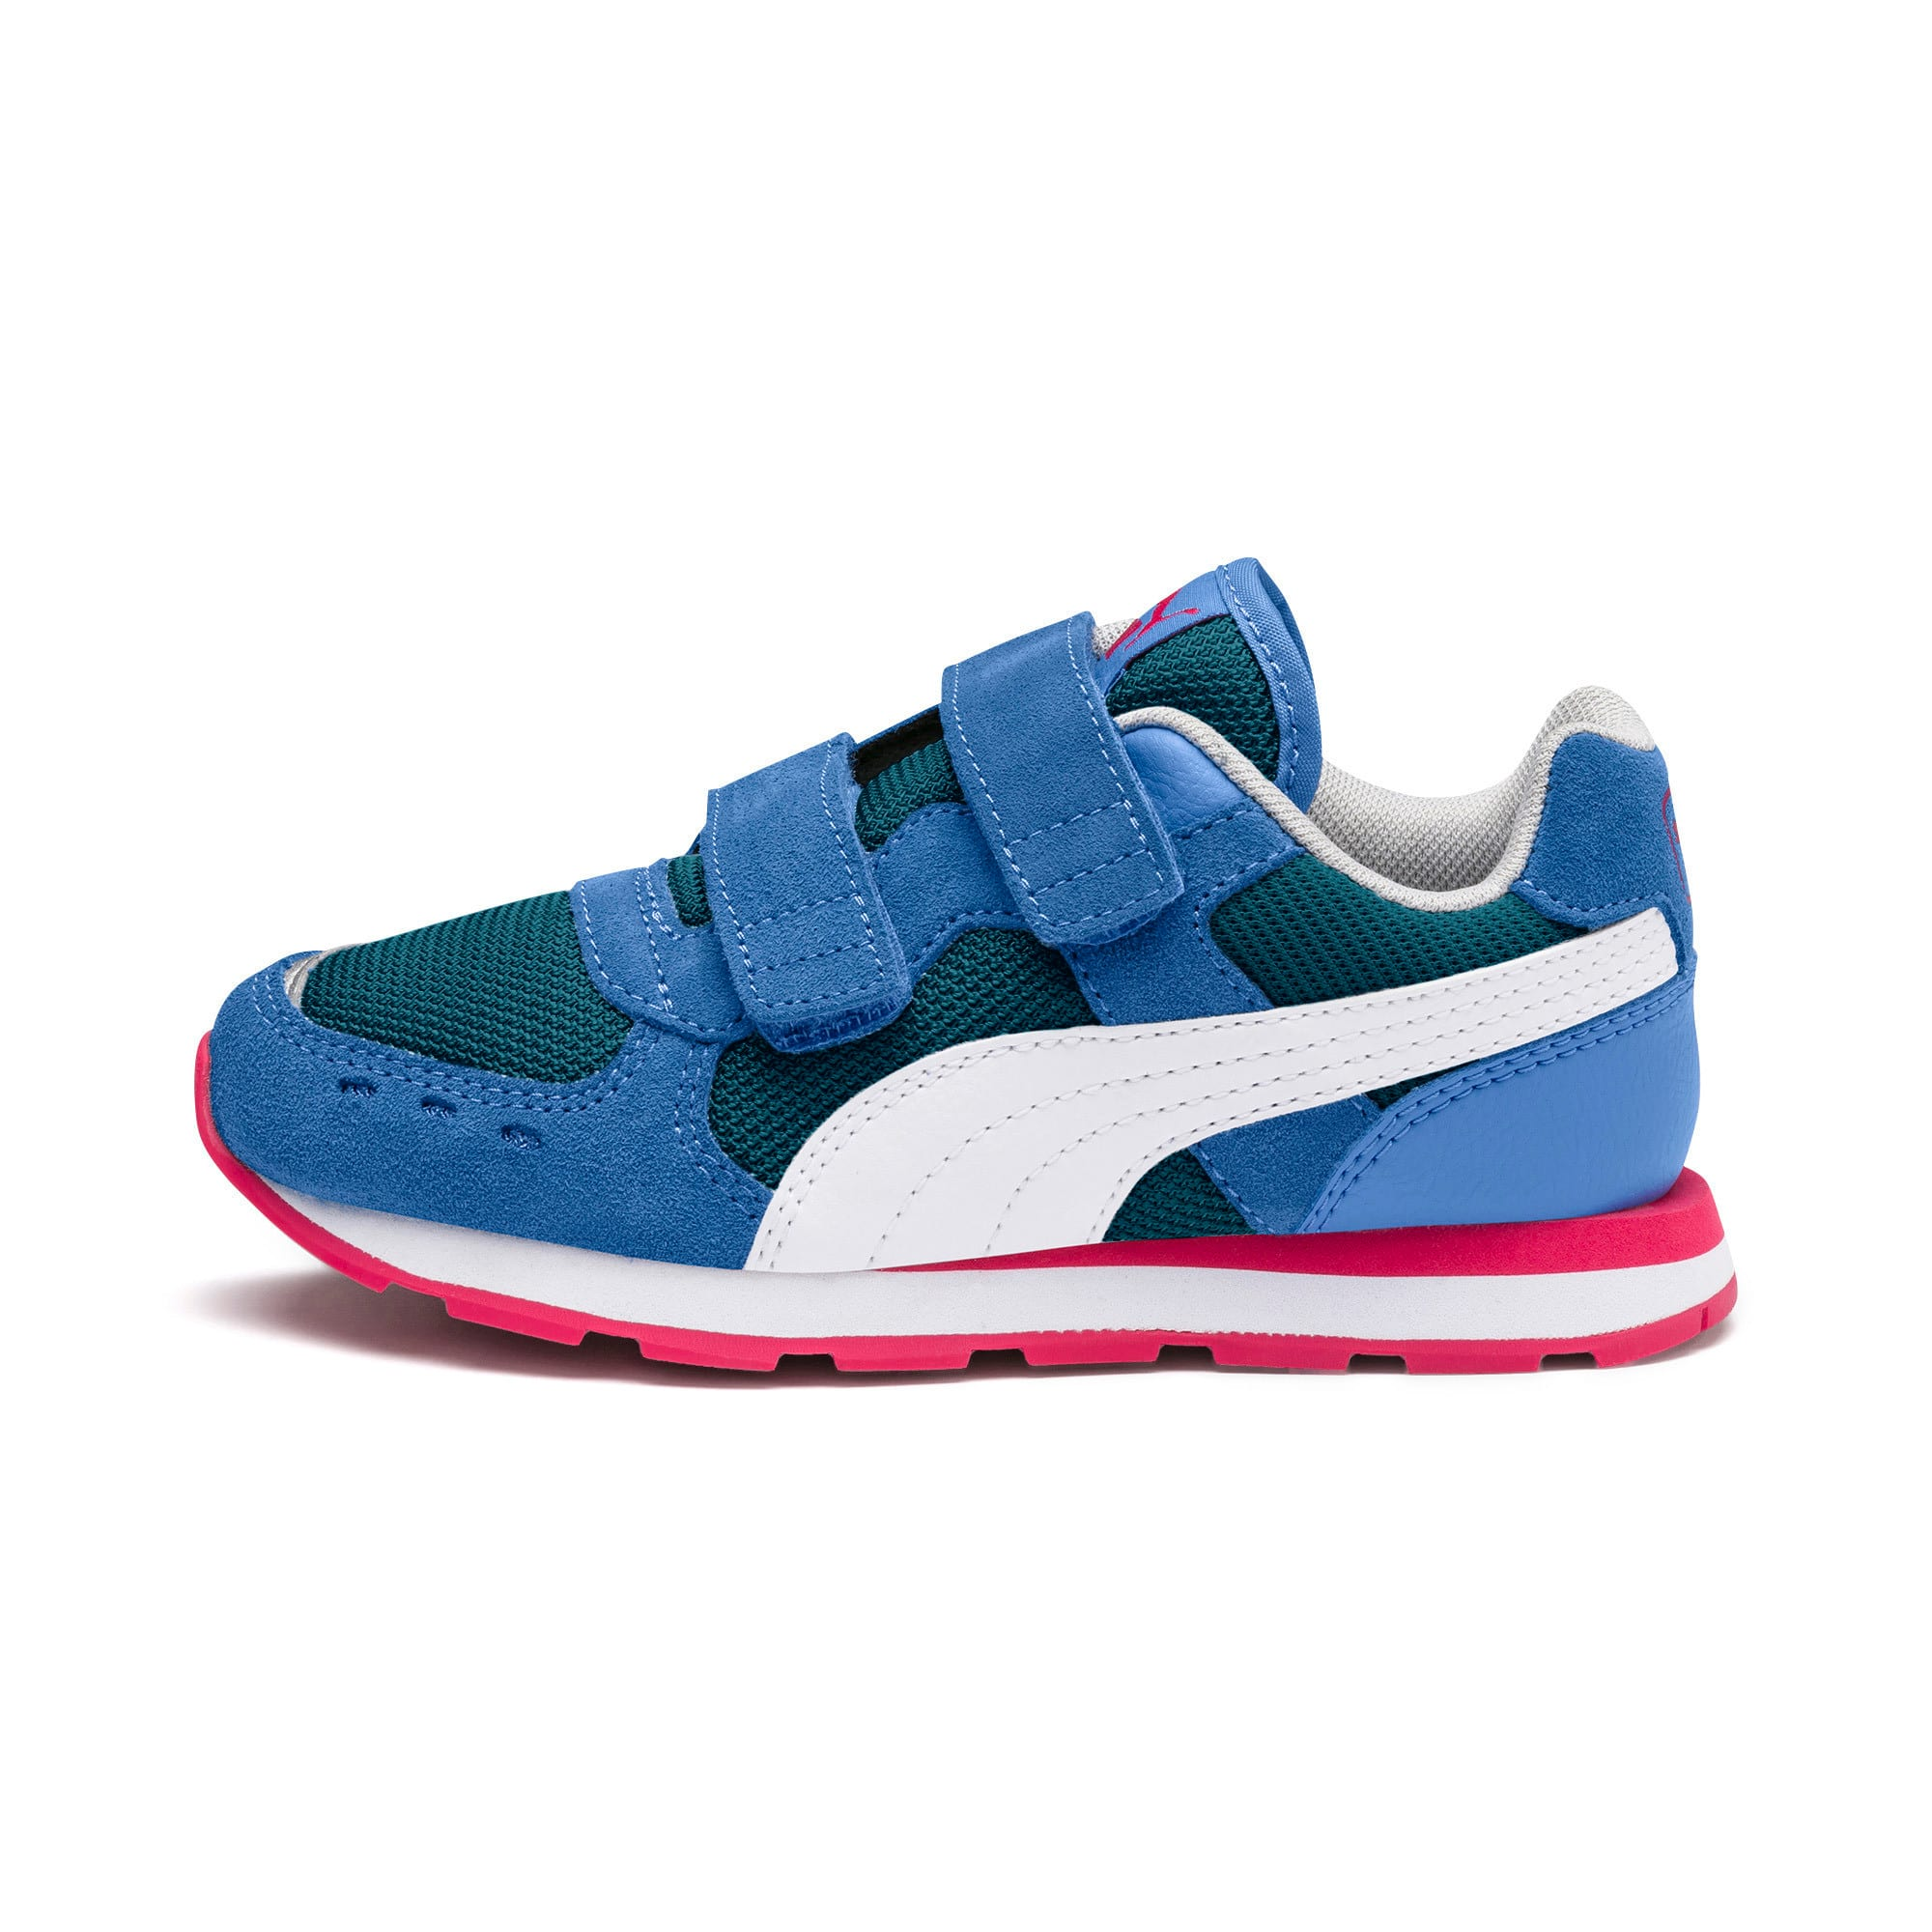 Miniatura 1 de Zapatos Vista para niños, Ultramarine-Puma White, mediano